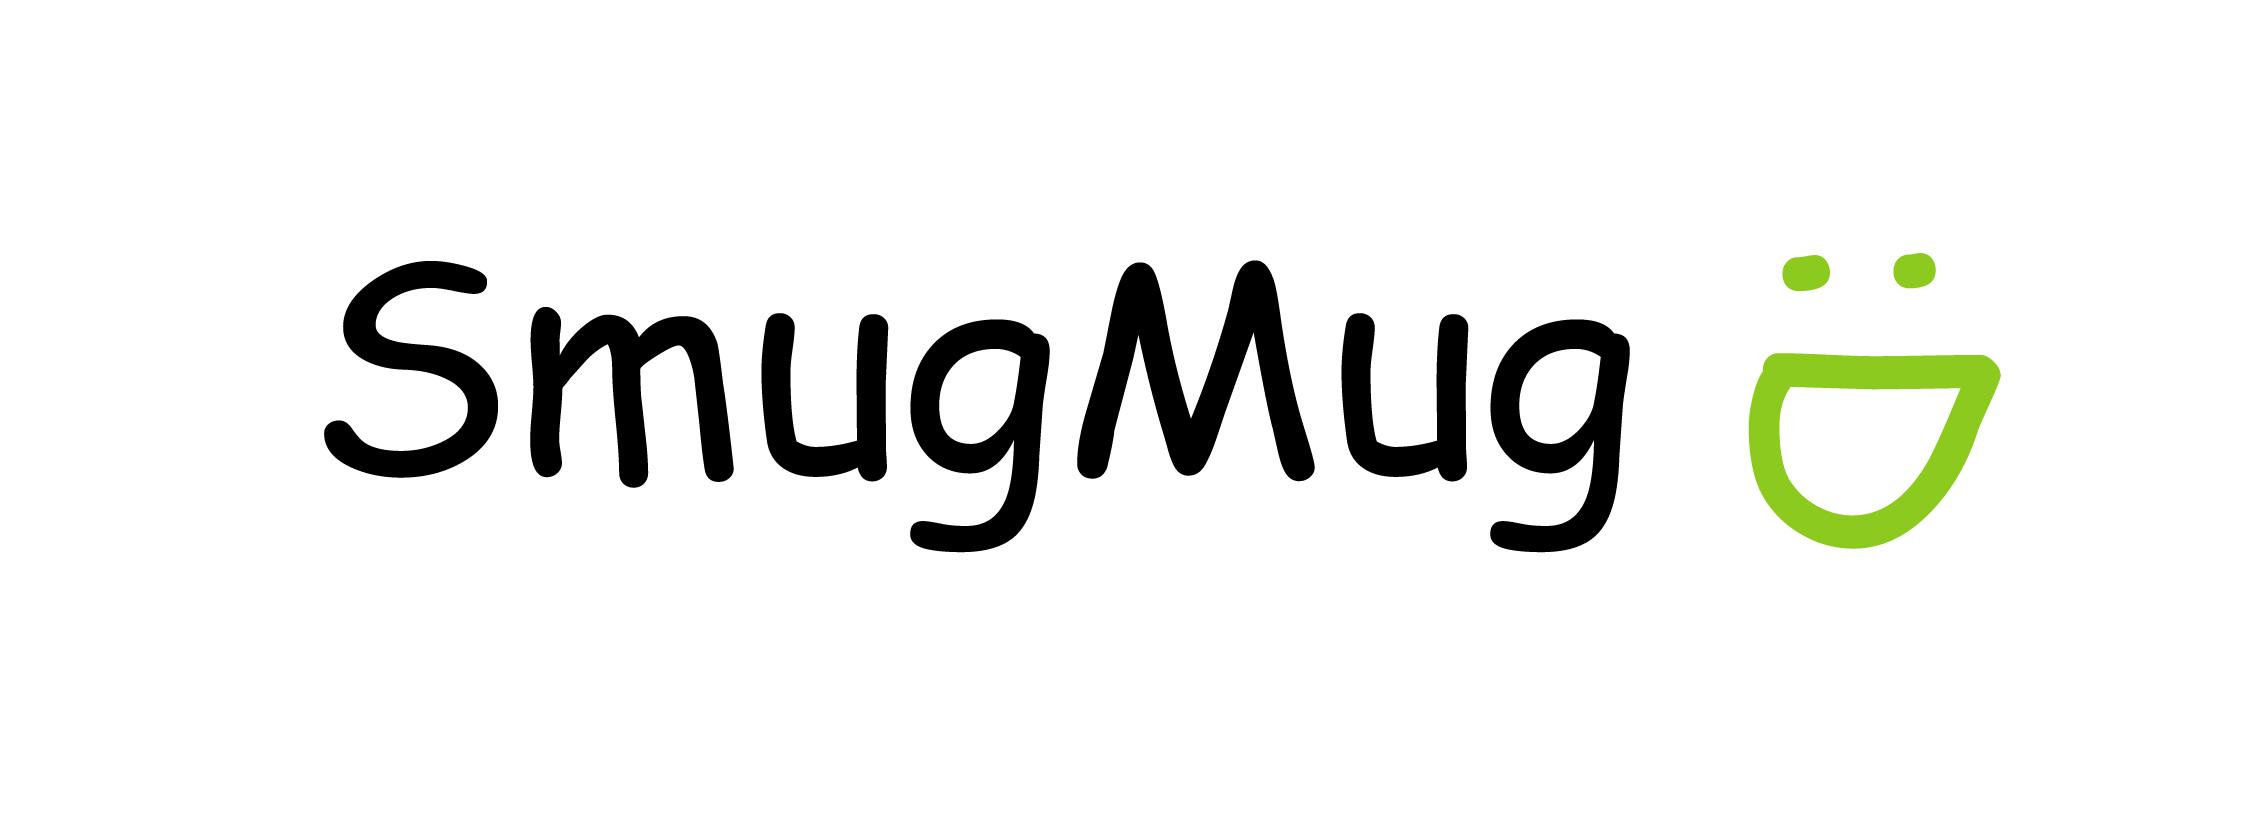 smugmug-logo-big-white